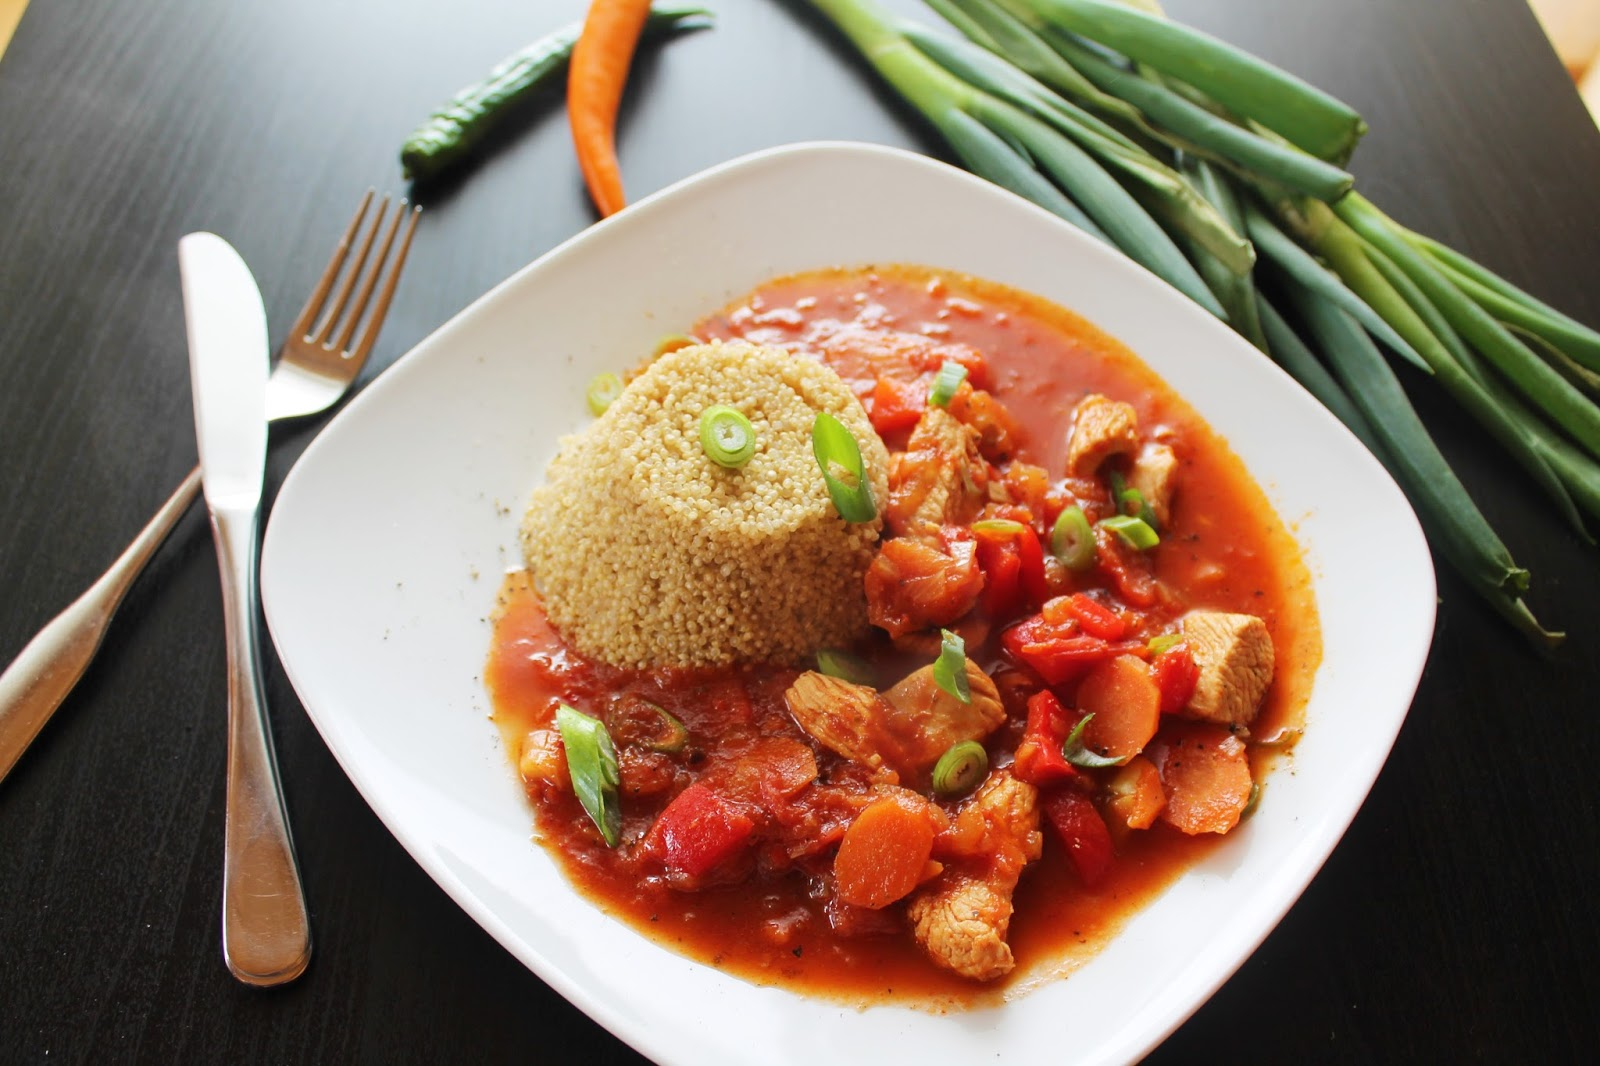 Hühnchen Auf Marokkanisch Mit Quinoa Cb With Andrea